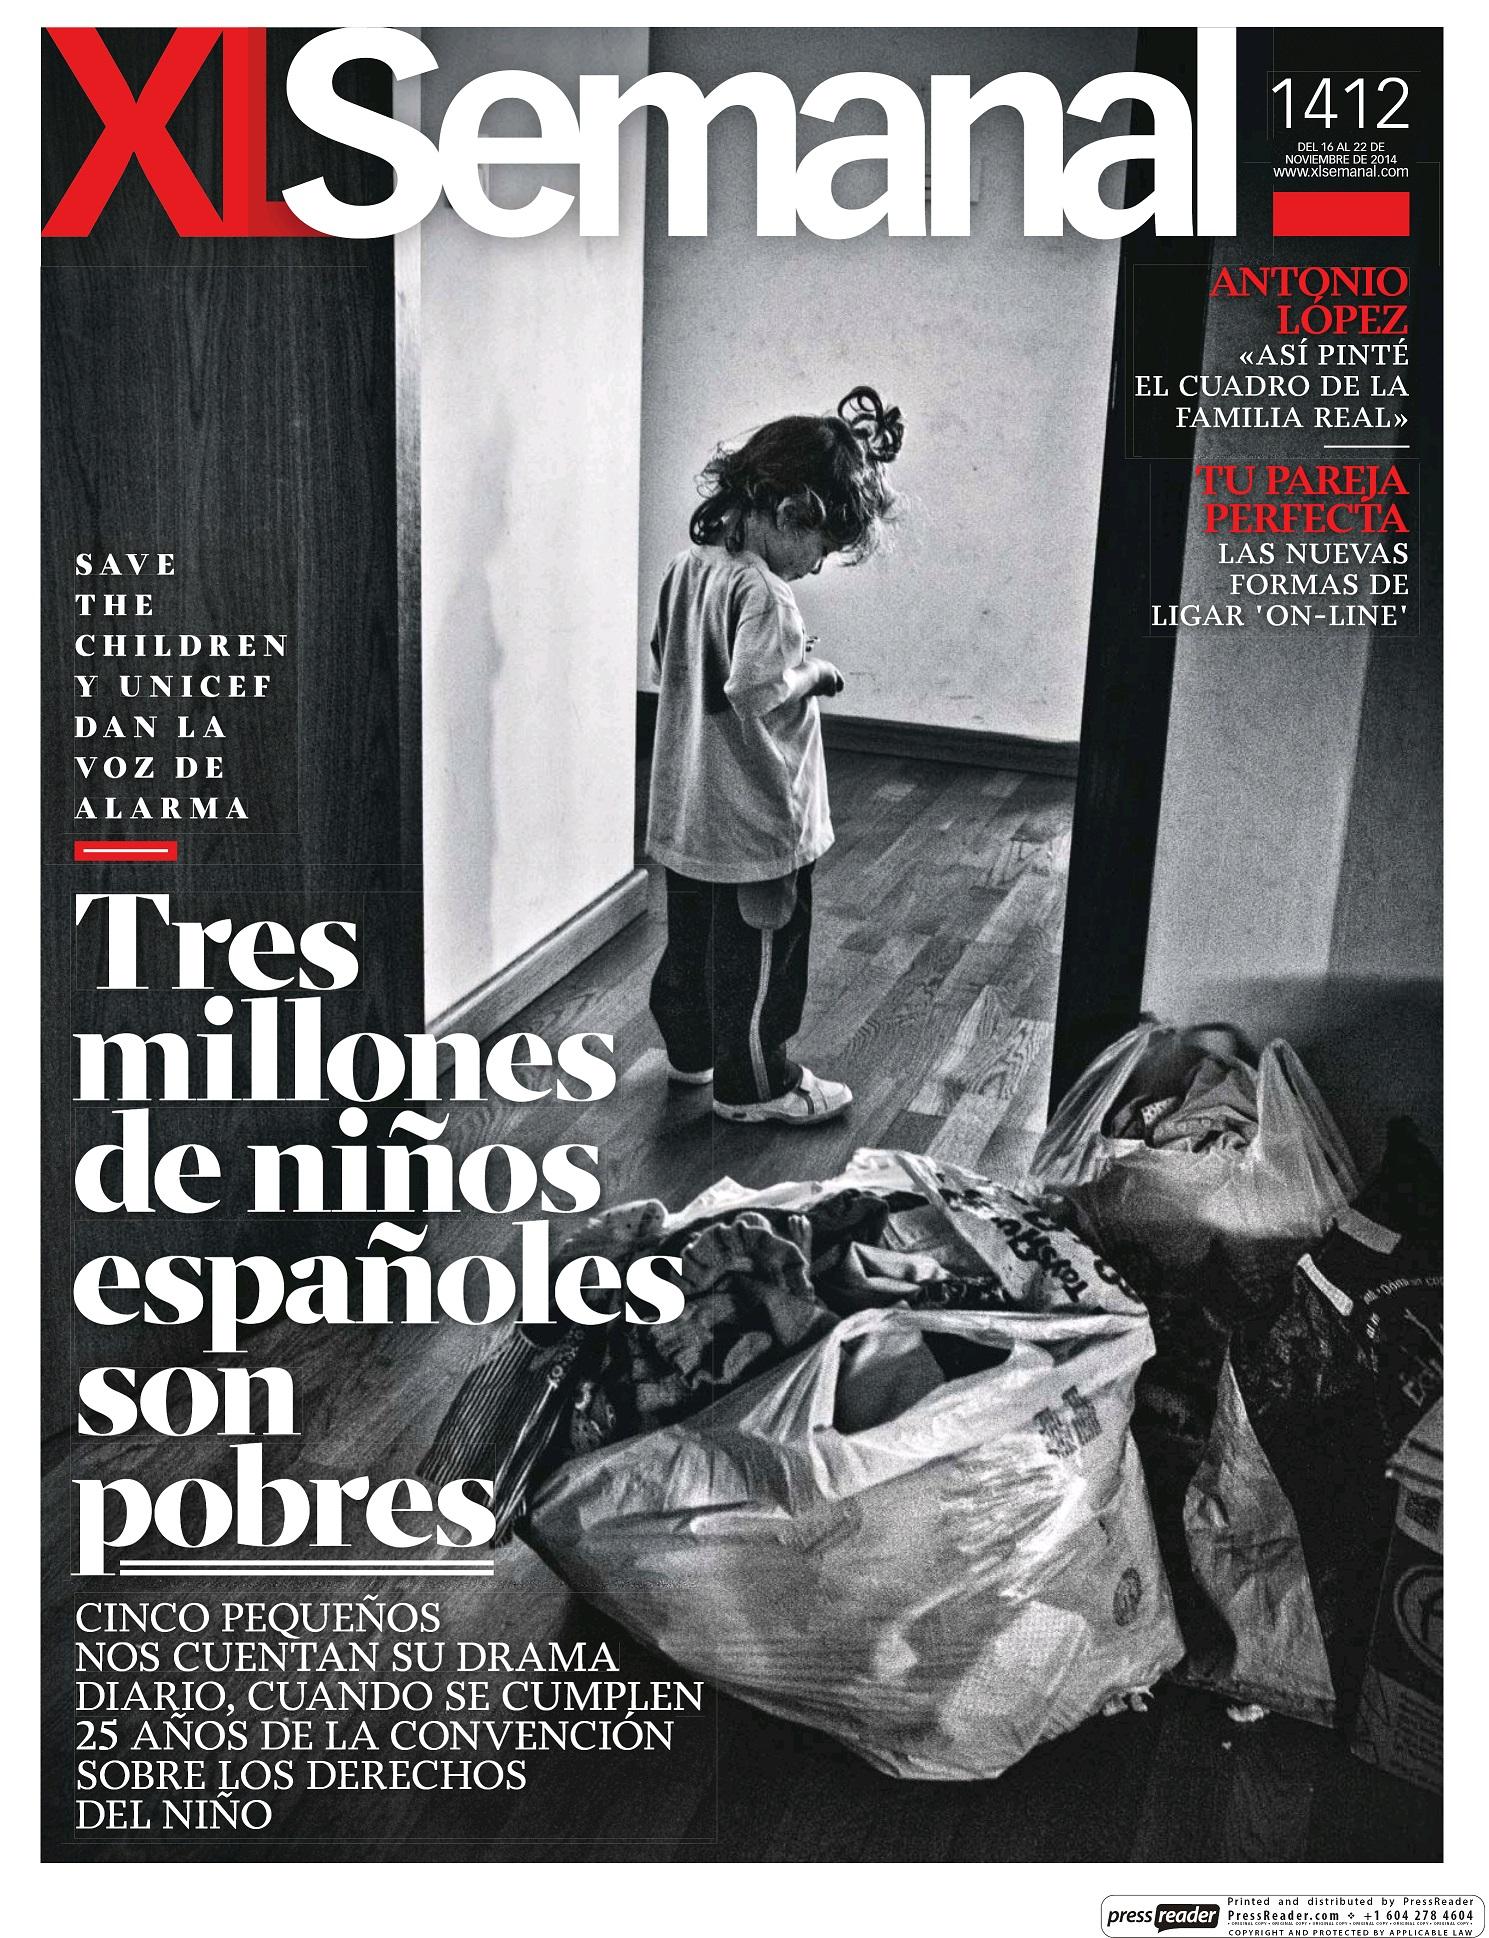 XL SEMANAL portada 16 de Noviembre 2014